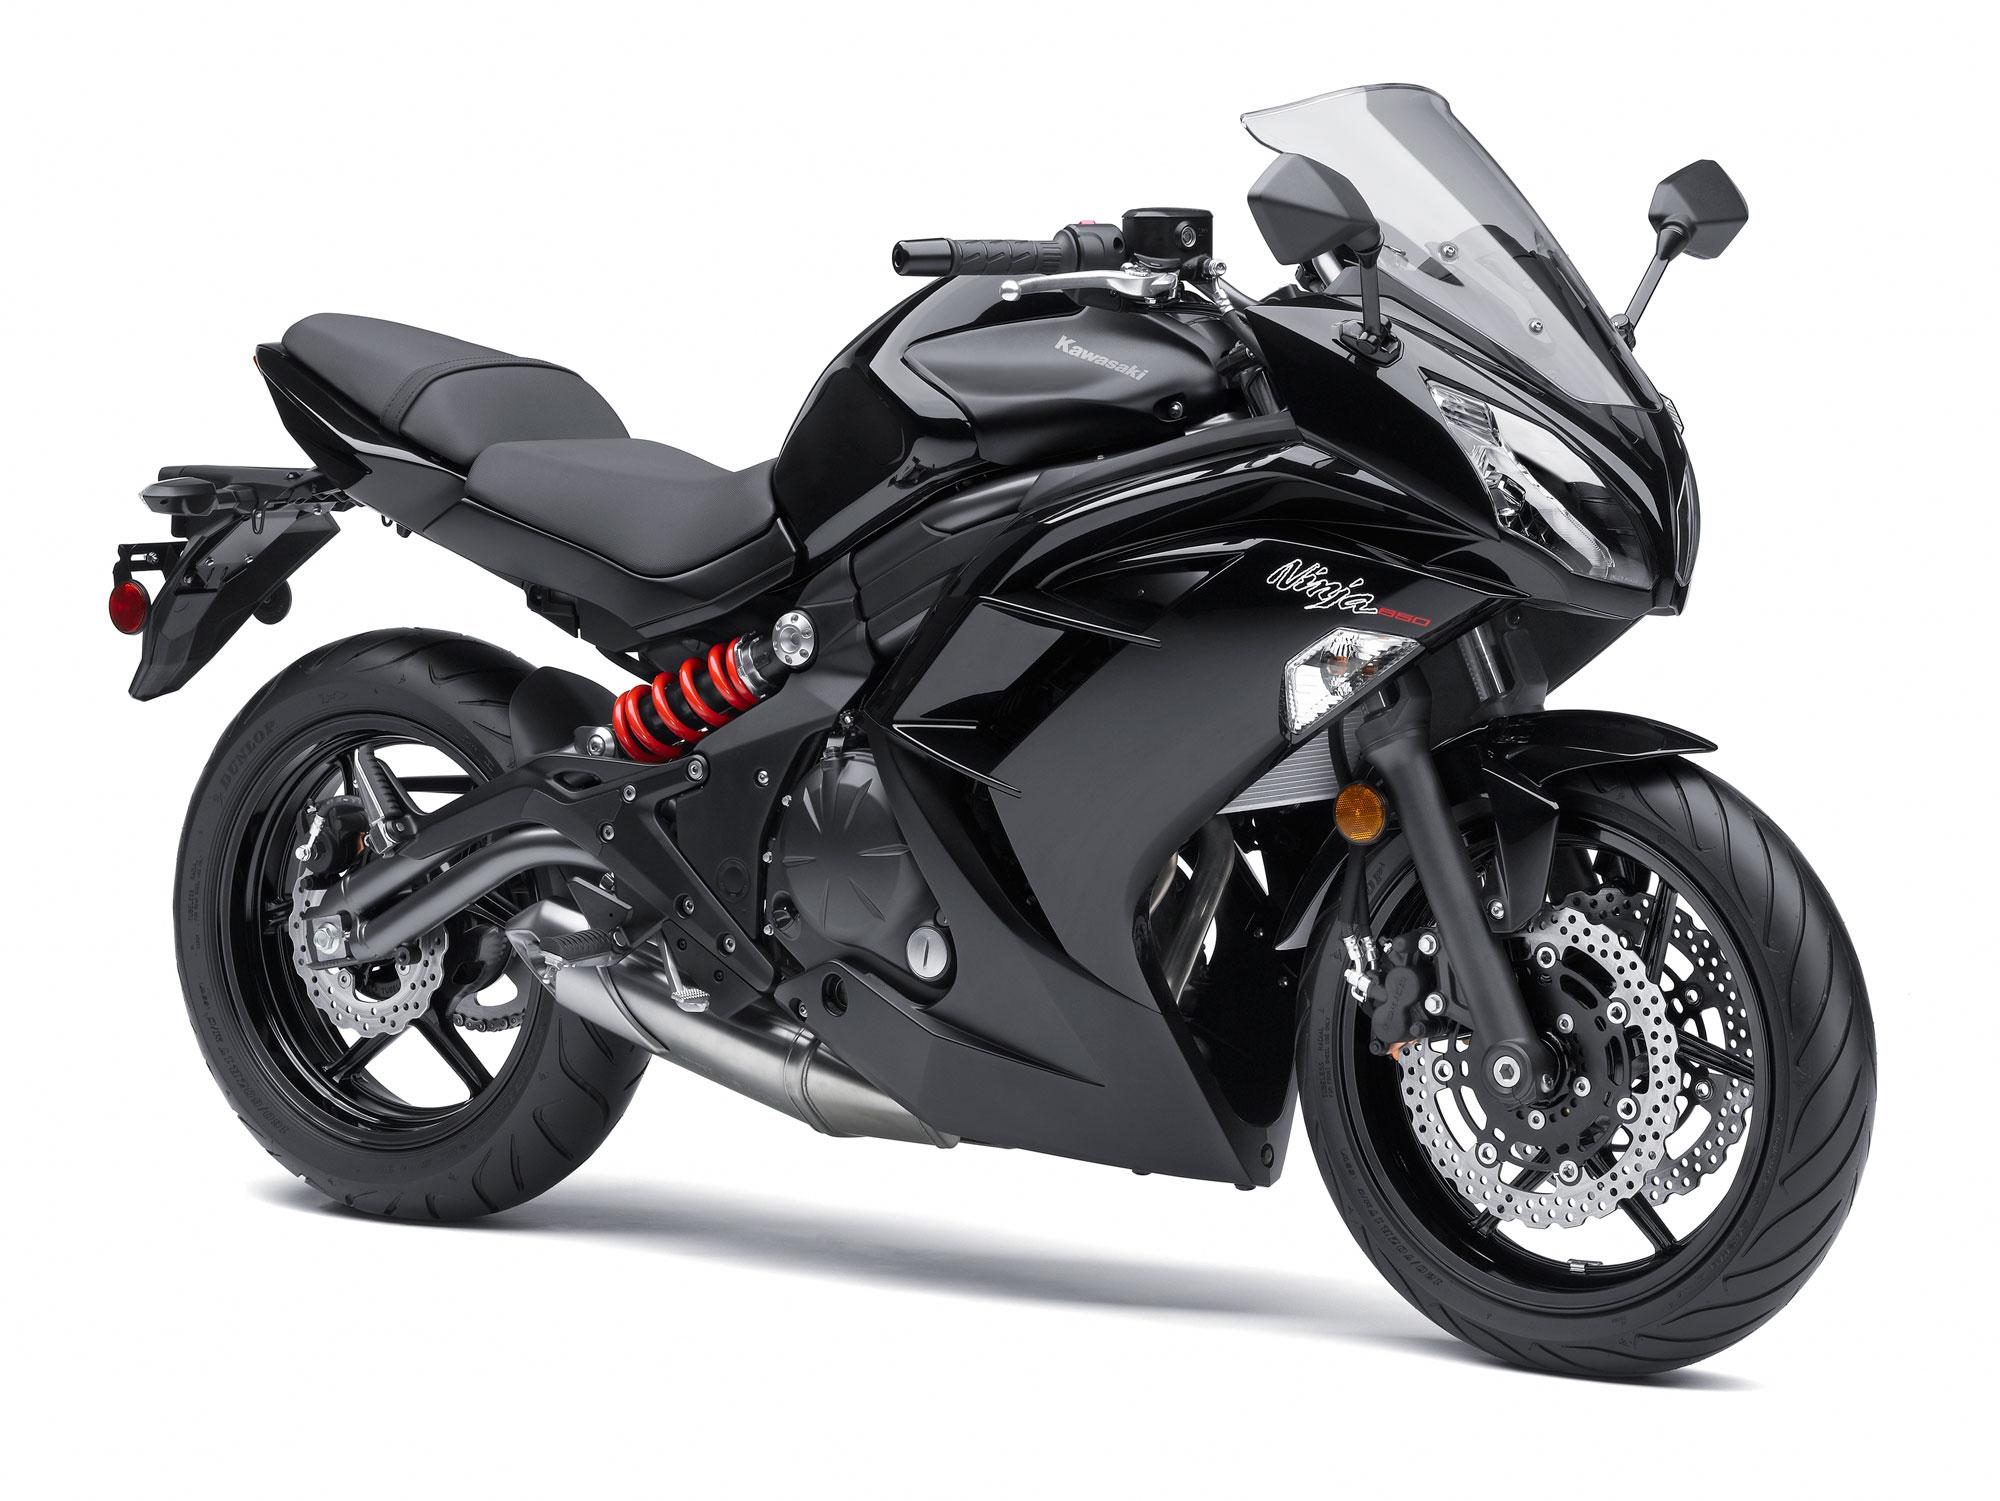 kawasaki ninja 650 2013 completamente renovada motos blog. Black Bedroom Furniture Sets. Home Design Ideas